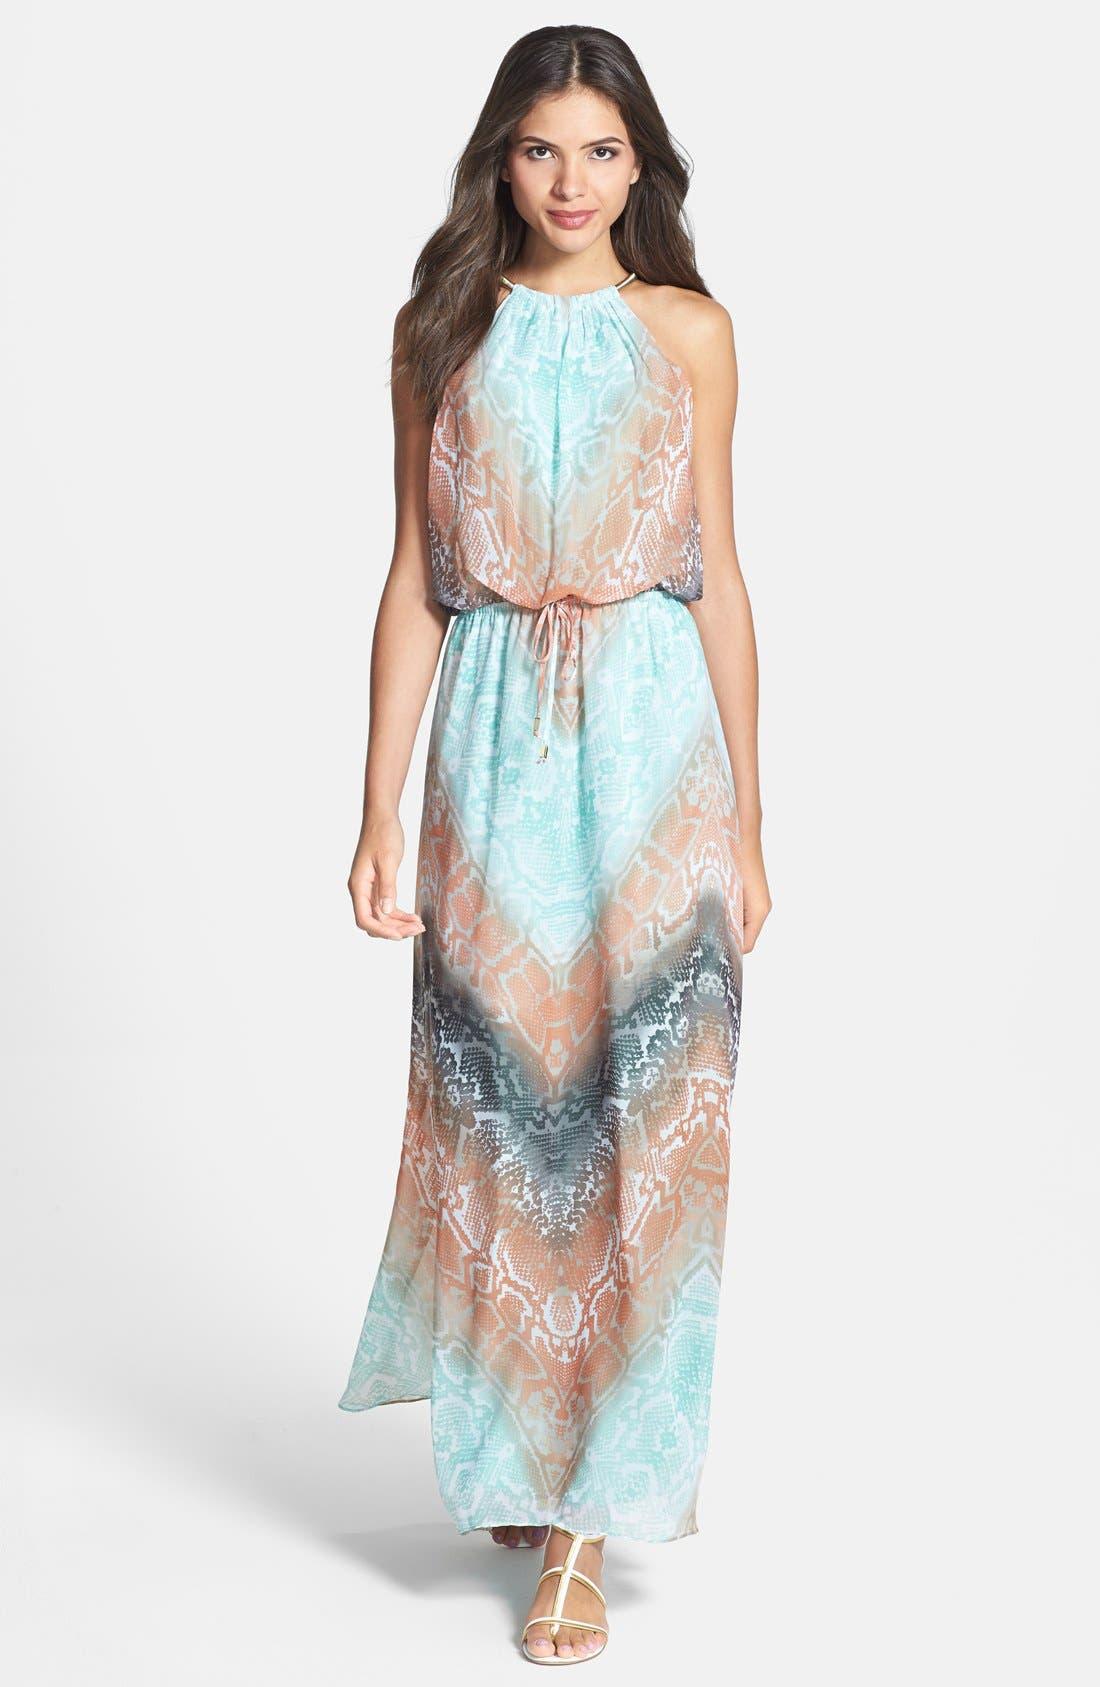 Alternate Image 1 Selected - Vince Camuto Print Chiffon Blouson Maxi Dress